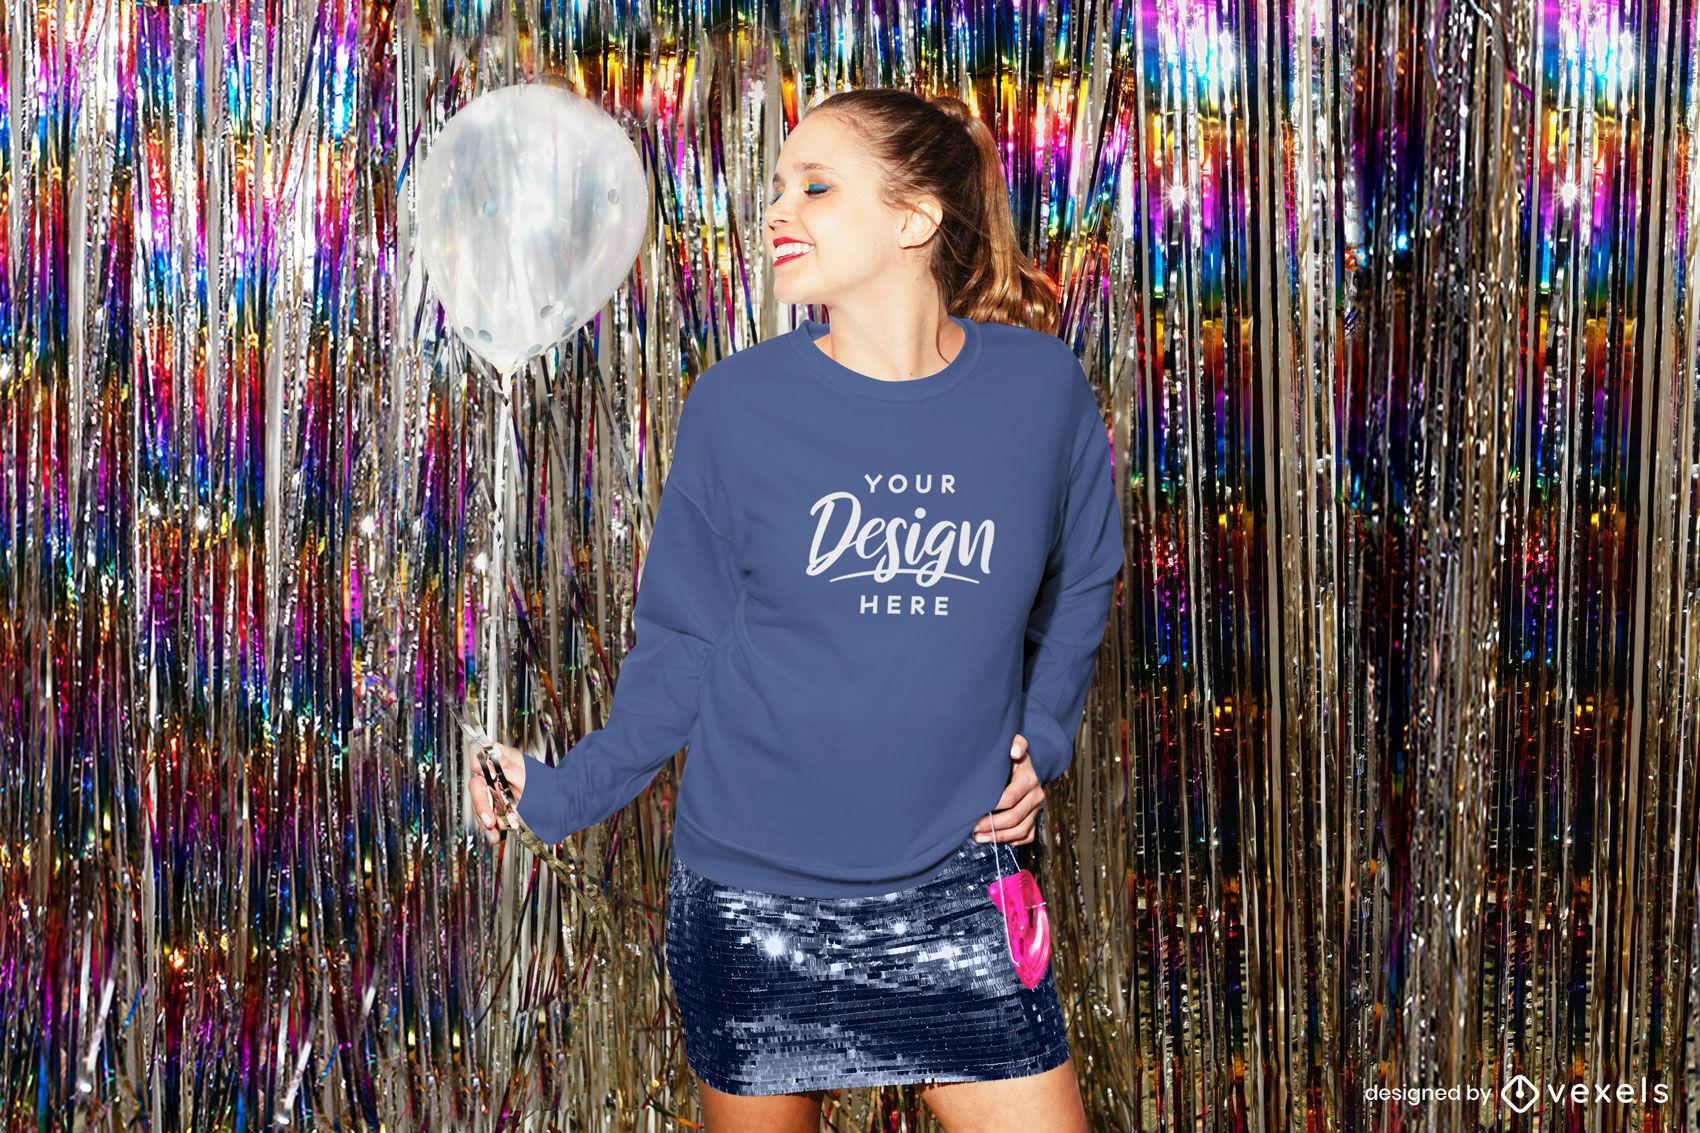 Blue sweatshirt girl in dance club background